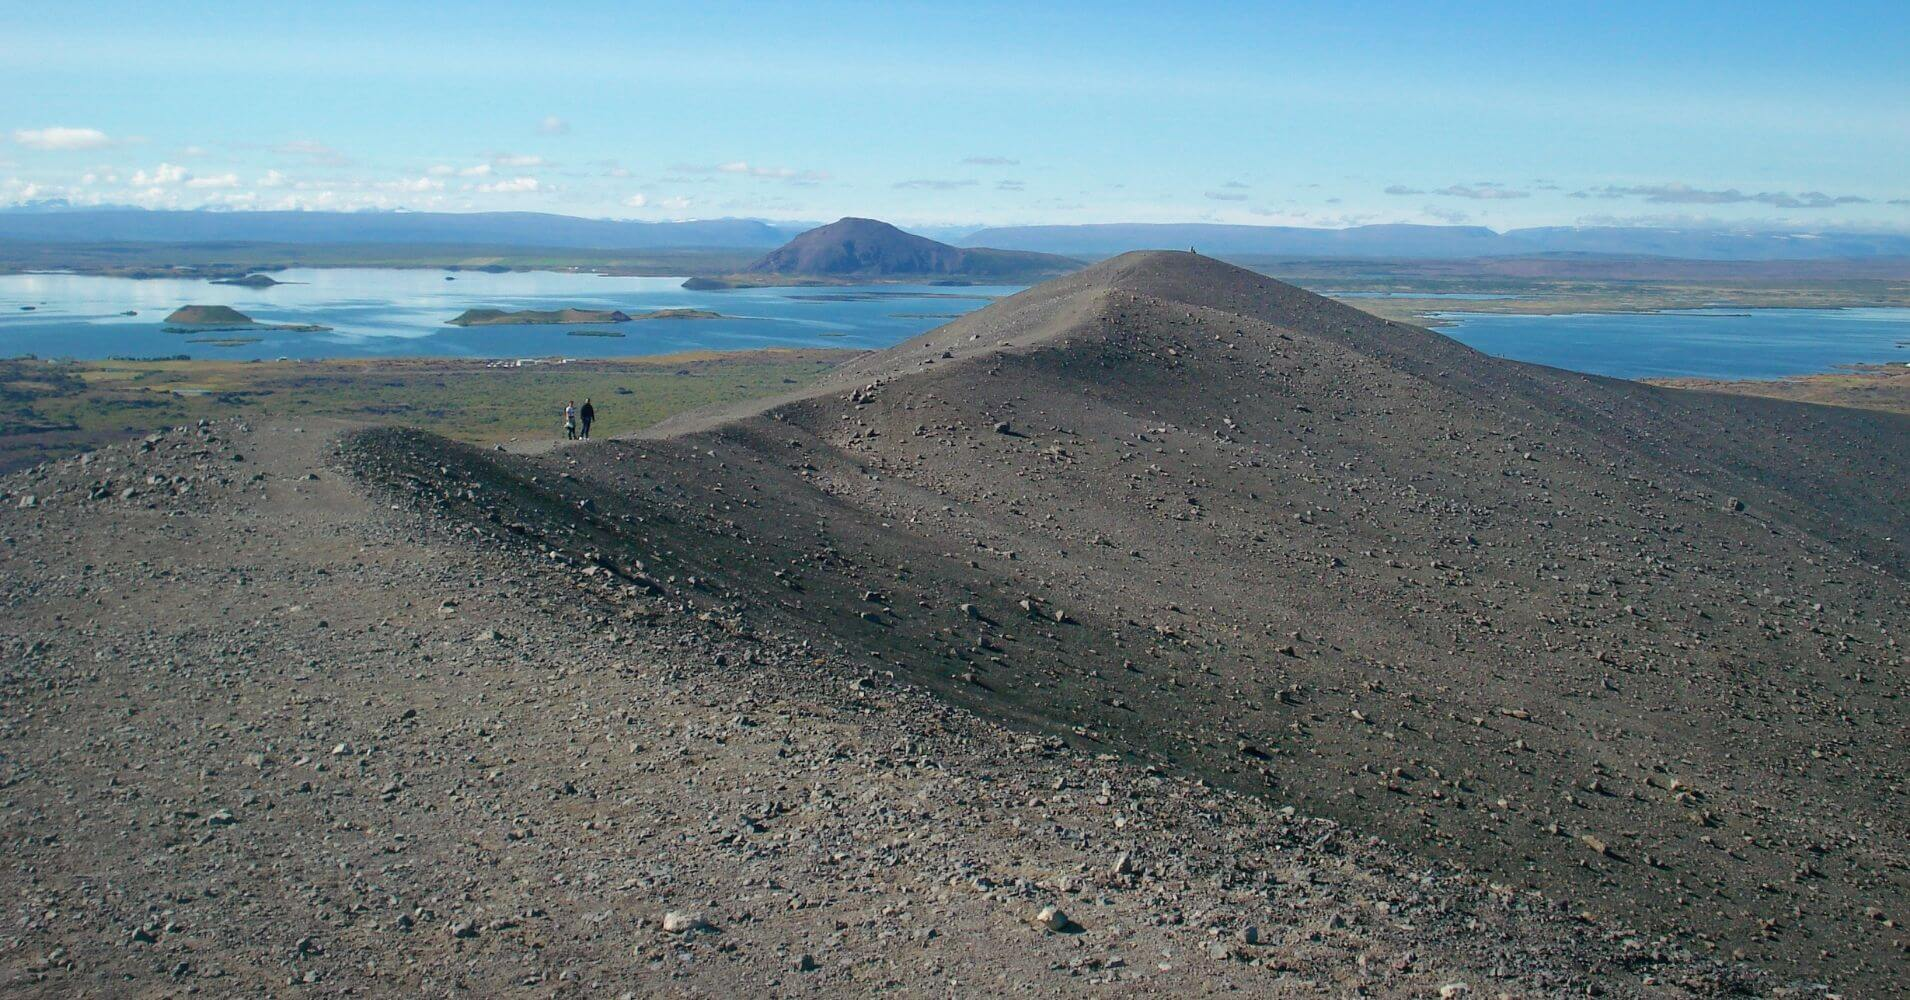 Cumbre del Volcán Hverfjall. Islandia.